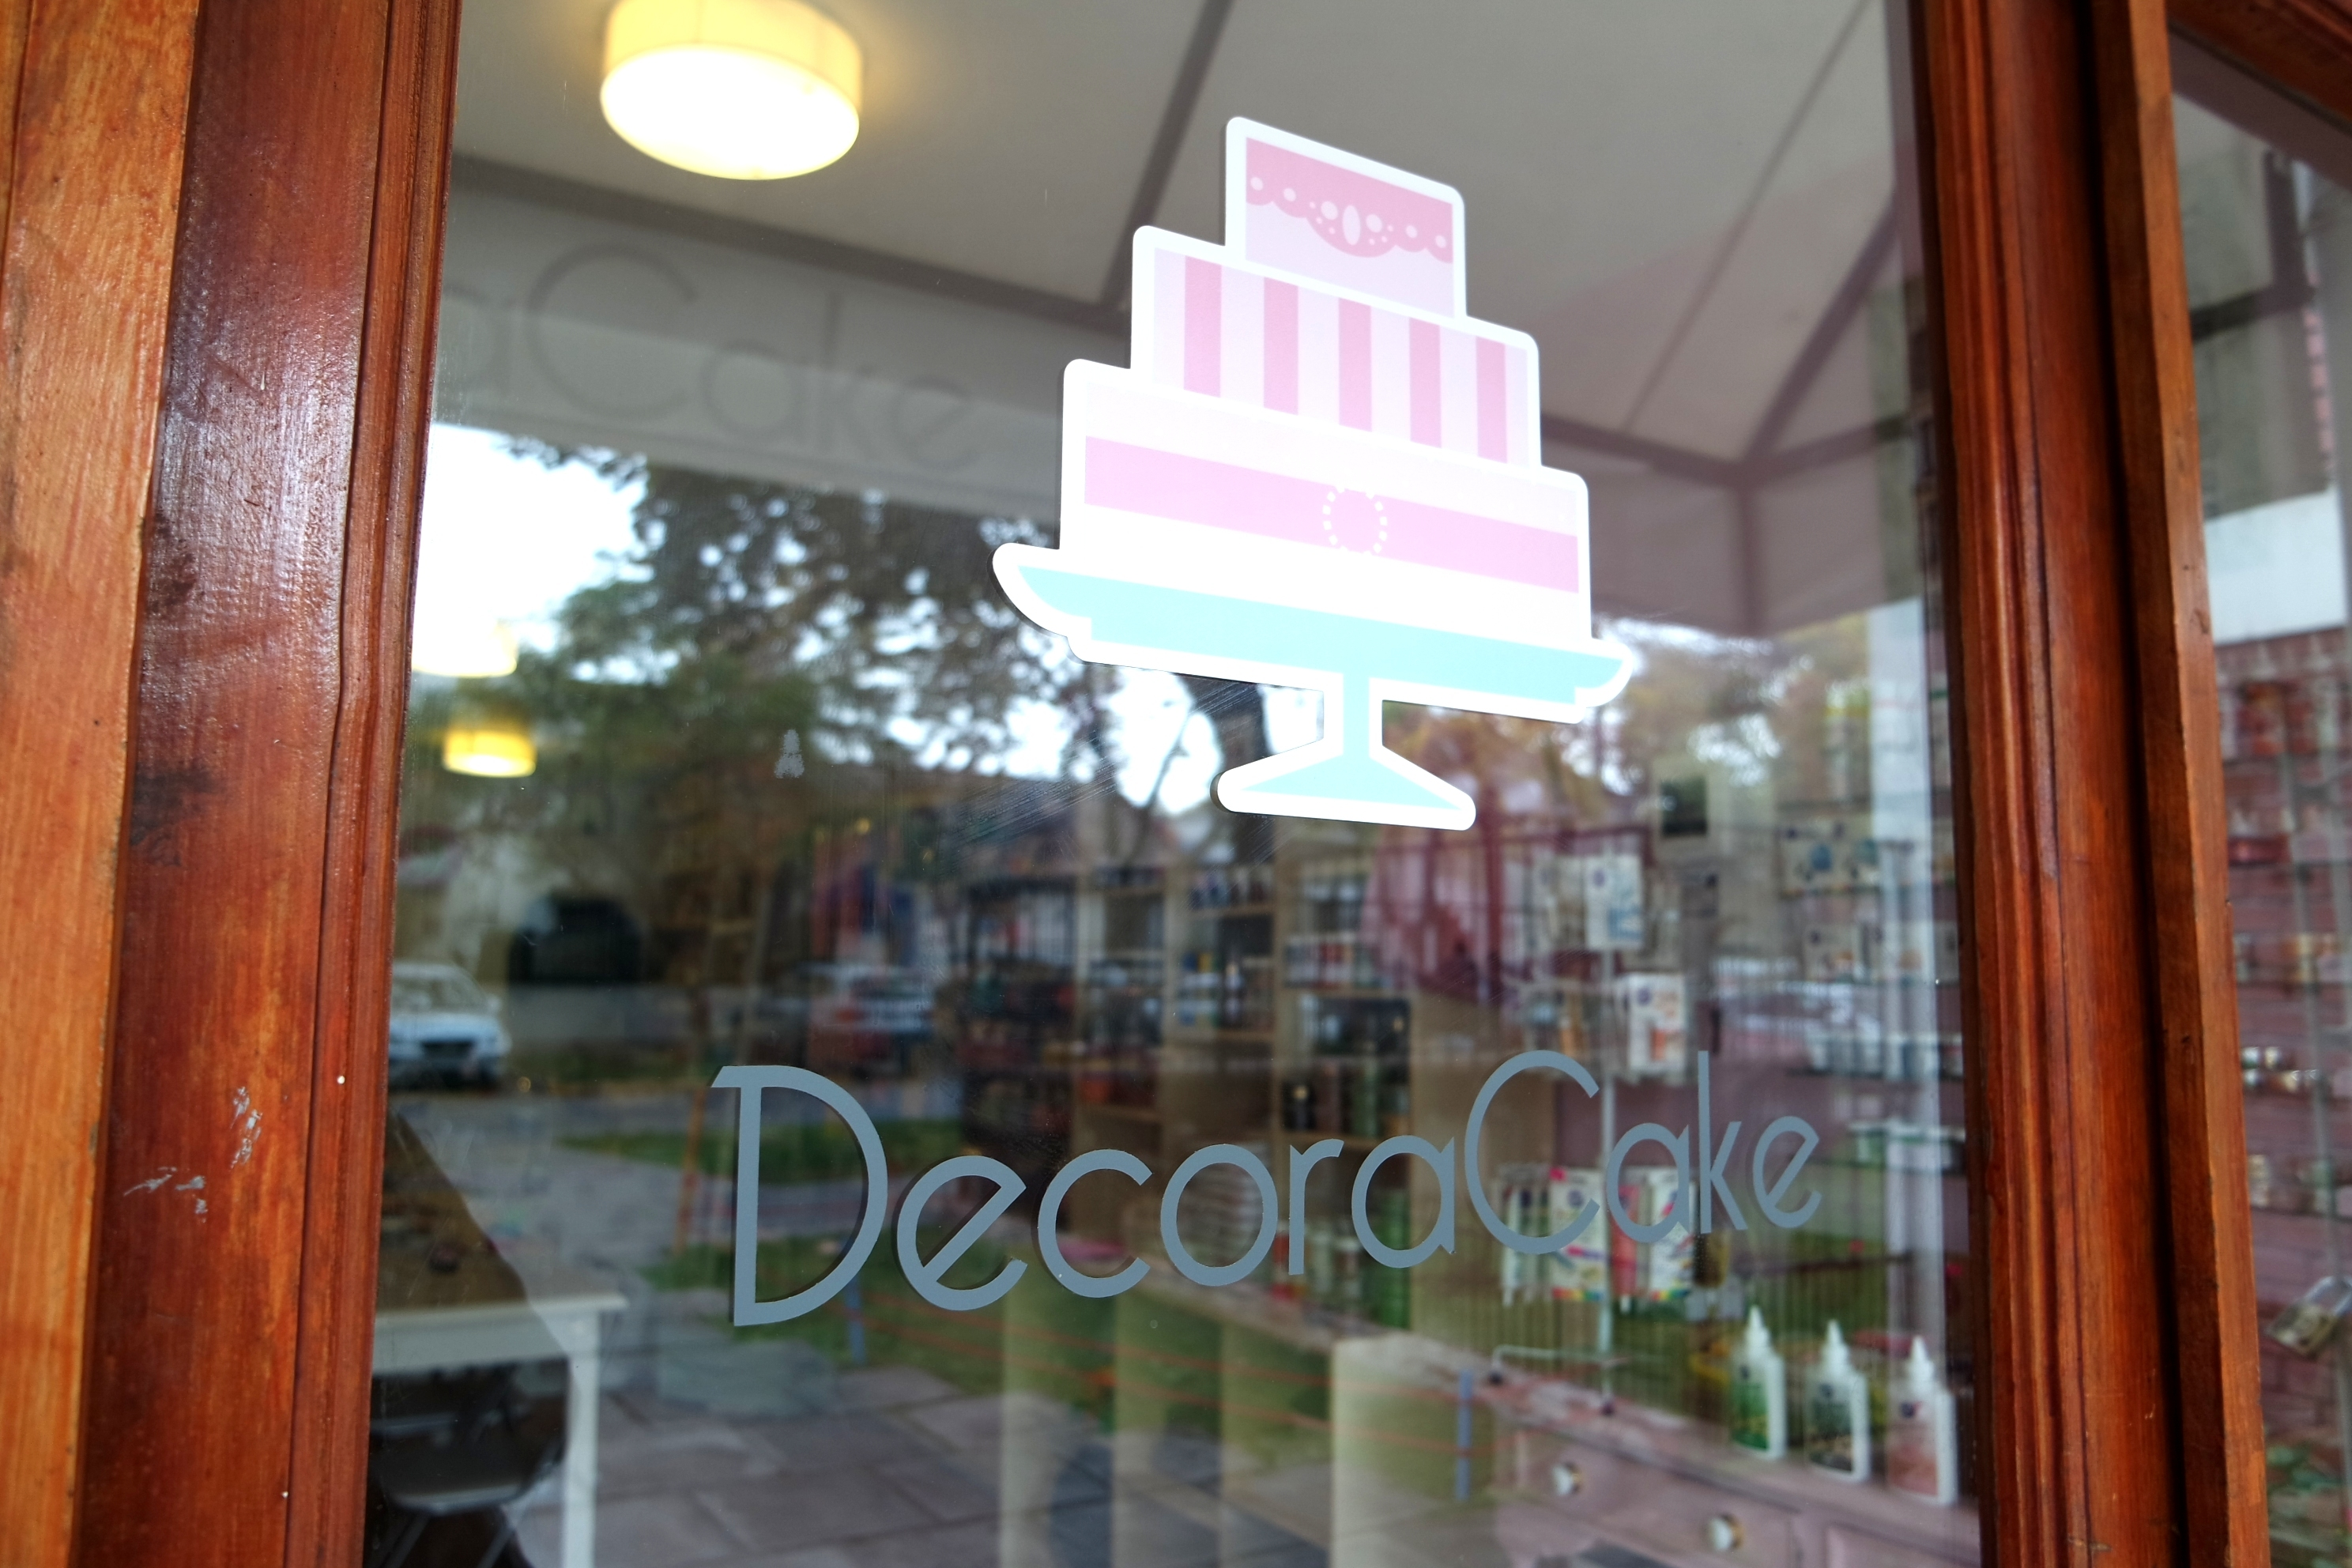 Lugares: DecoraCake [Barrio Italia]